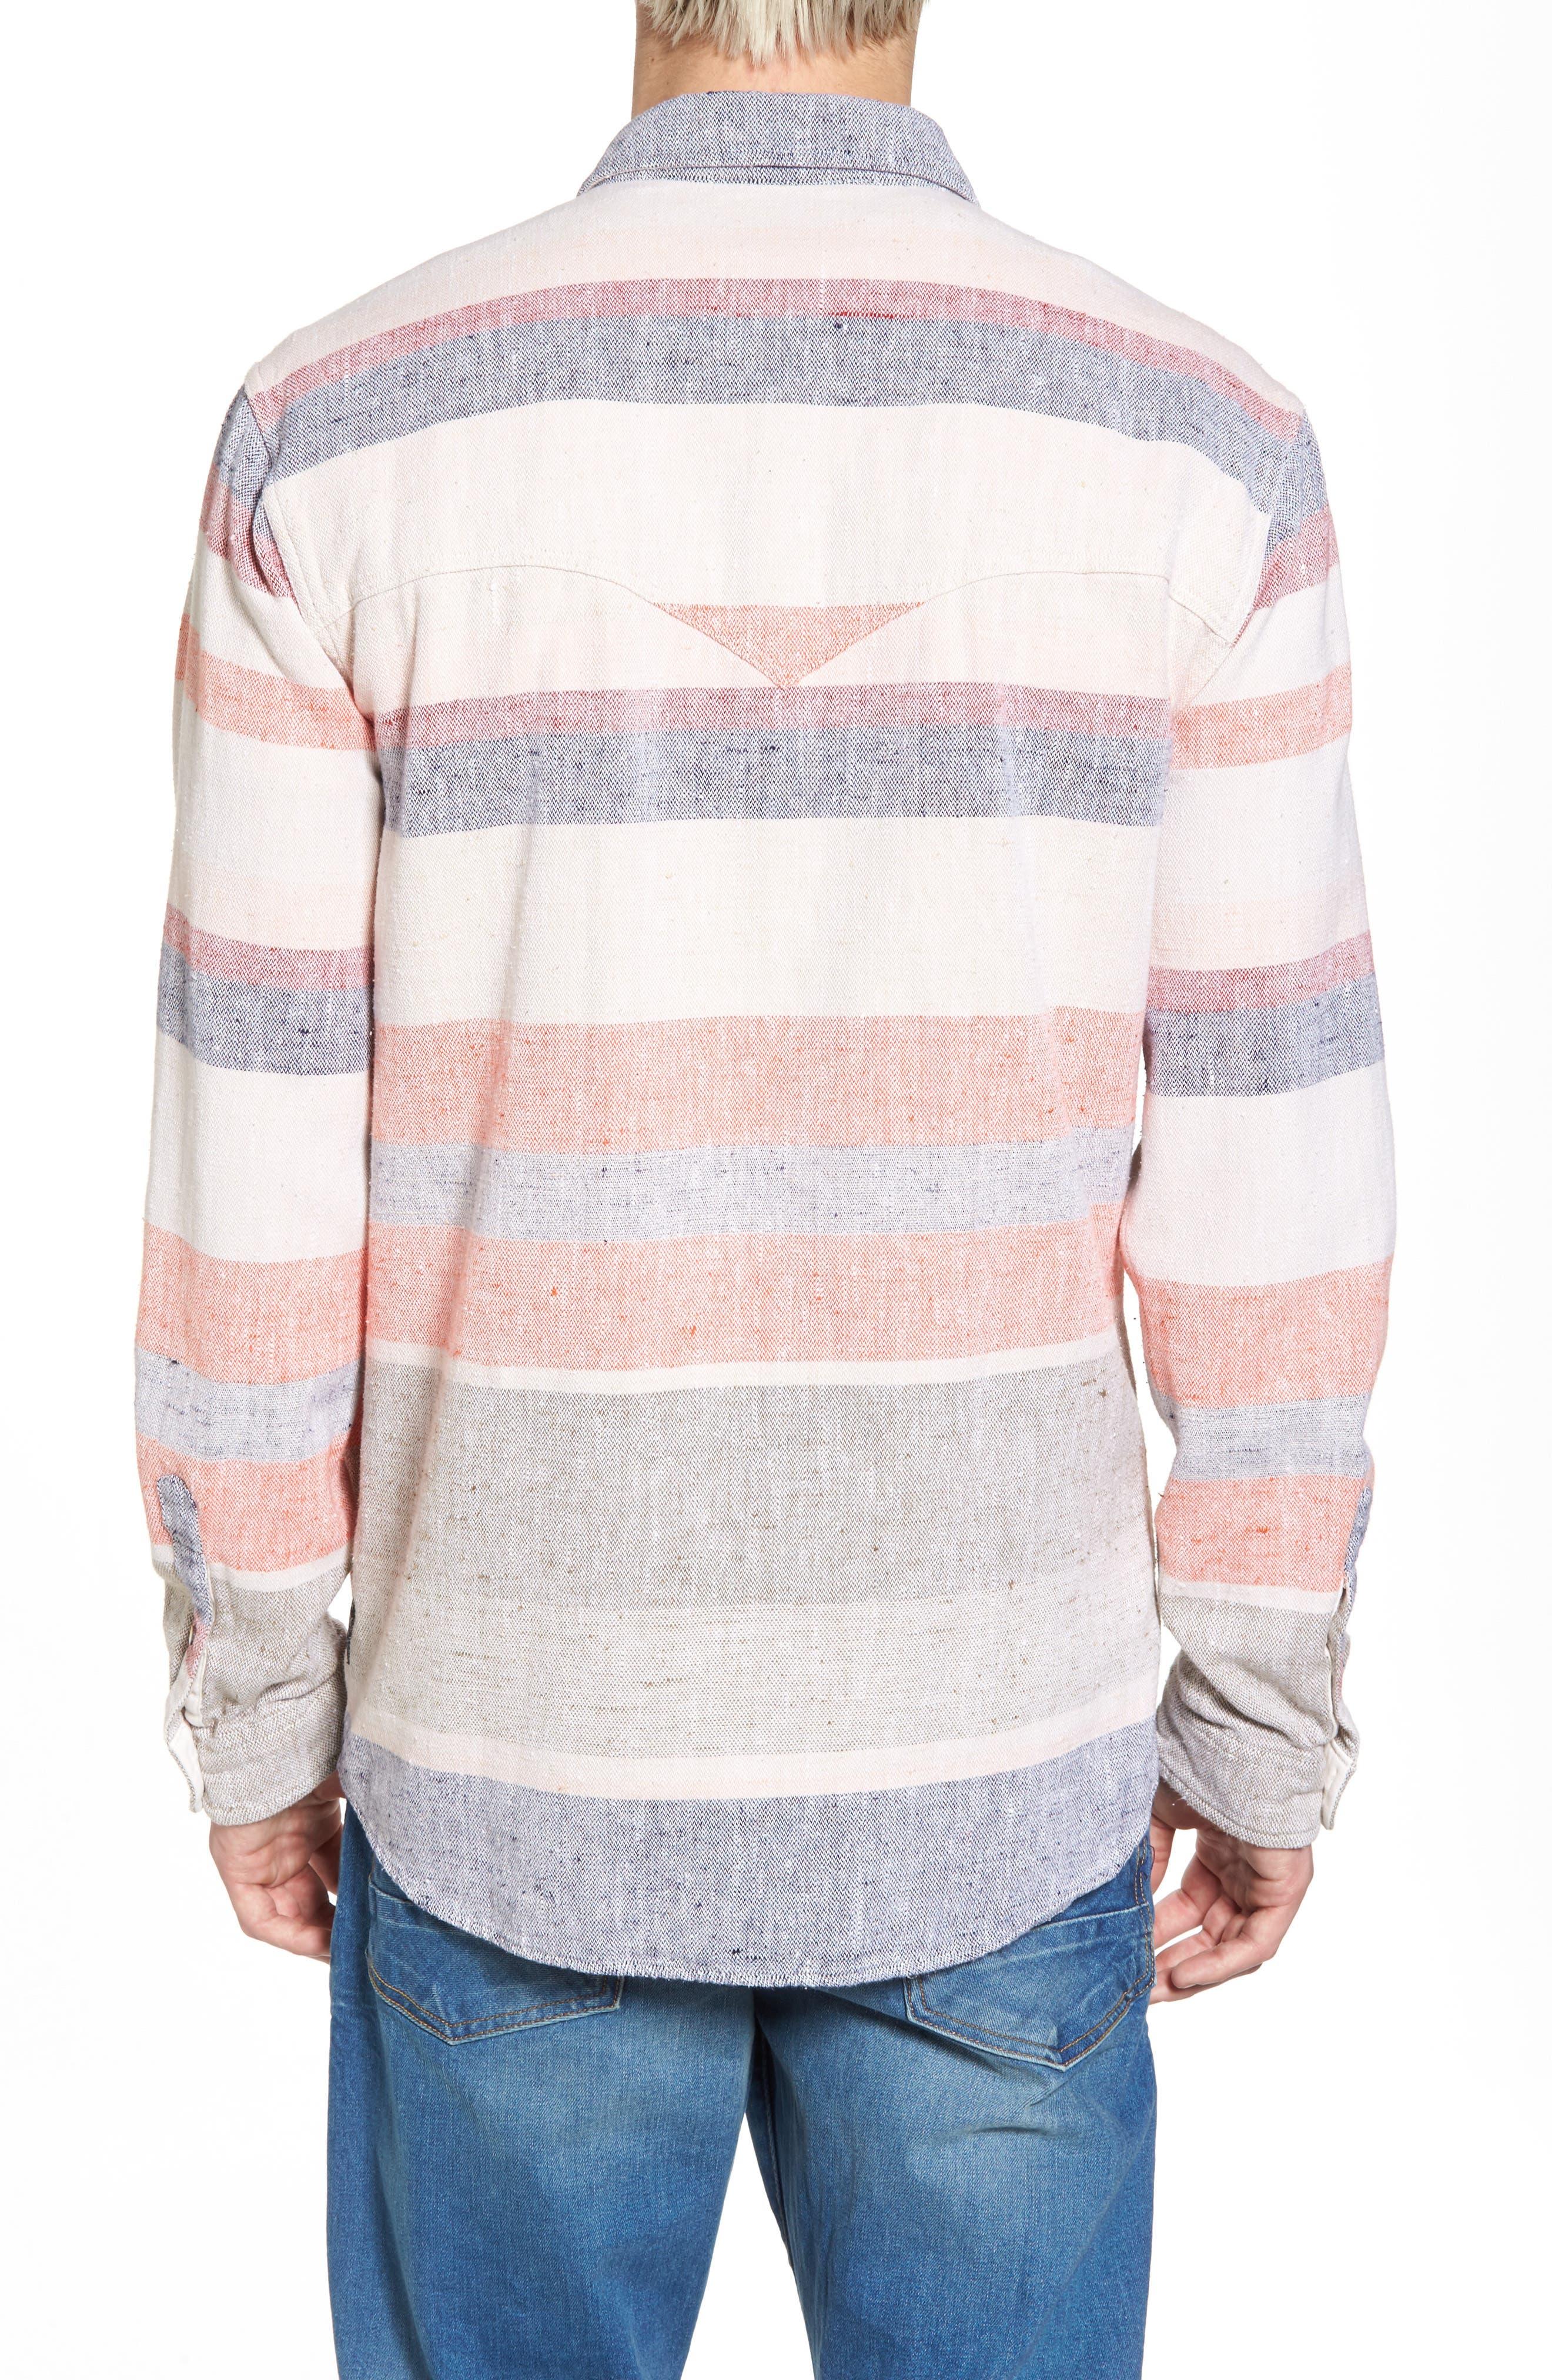 Amsterdams Summery Chunk Shirt,                             Alternate thumbnail 2, color,                             020